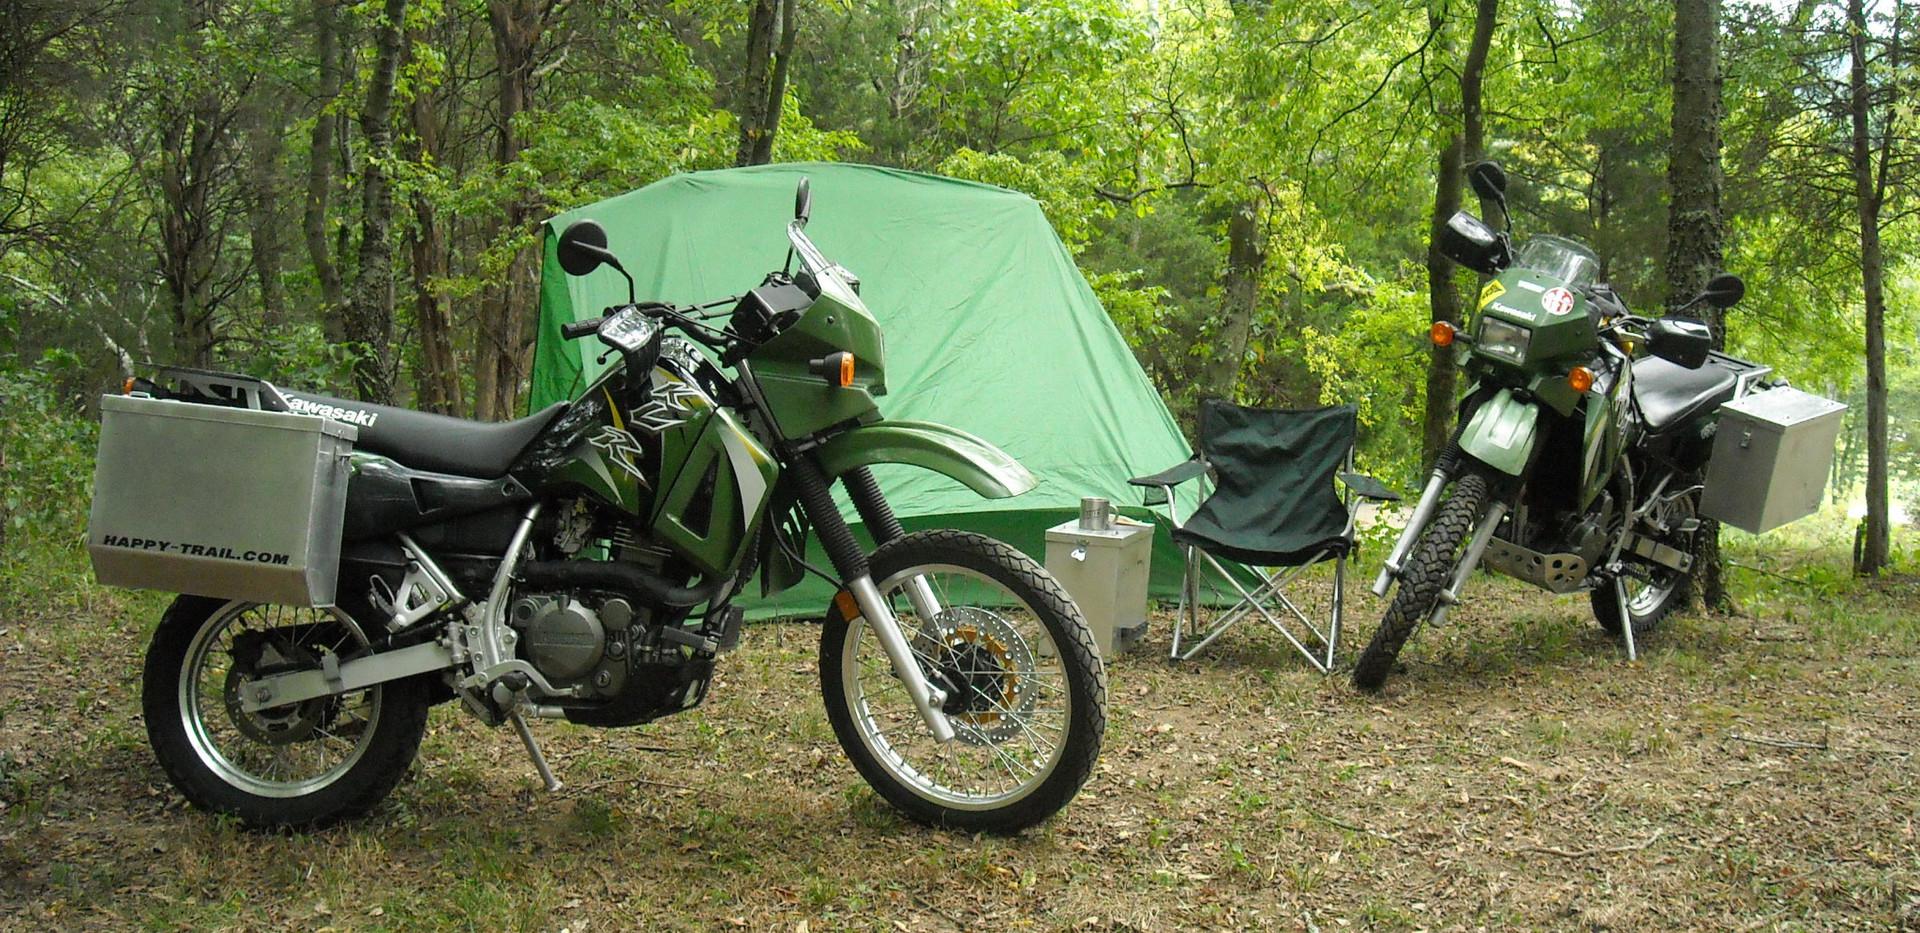 motorcycle-camping.jpg